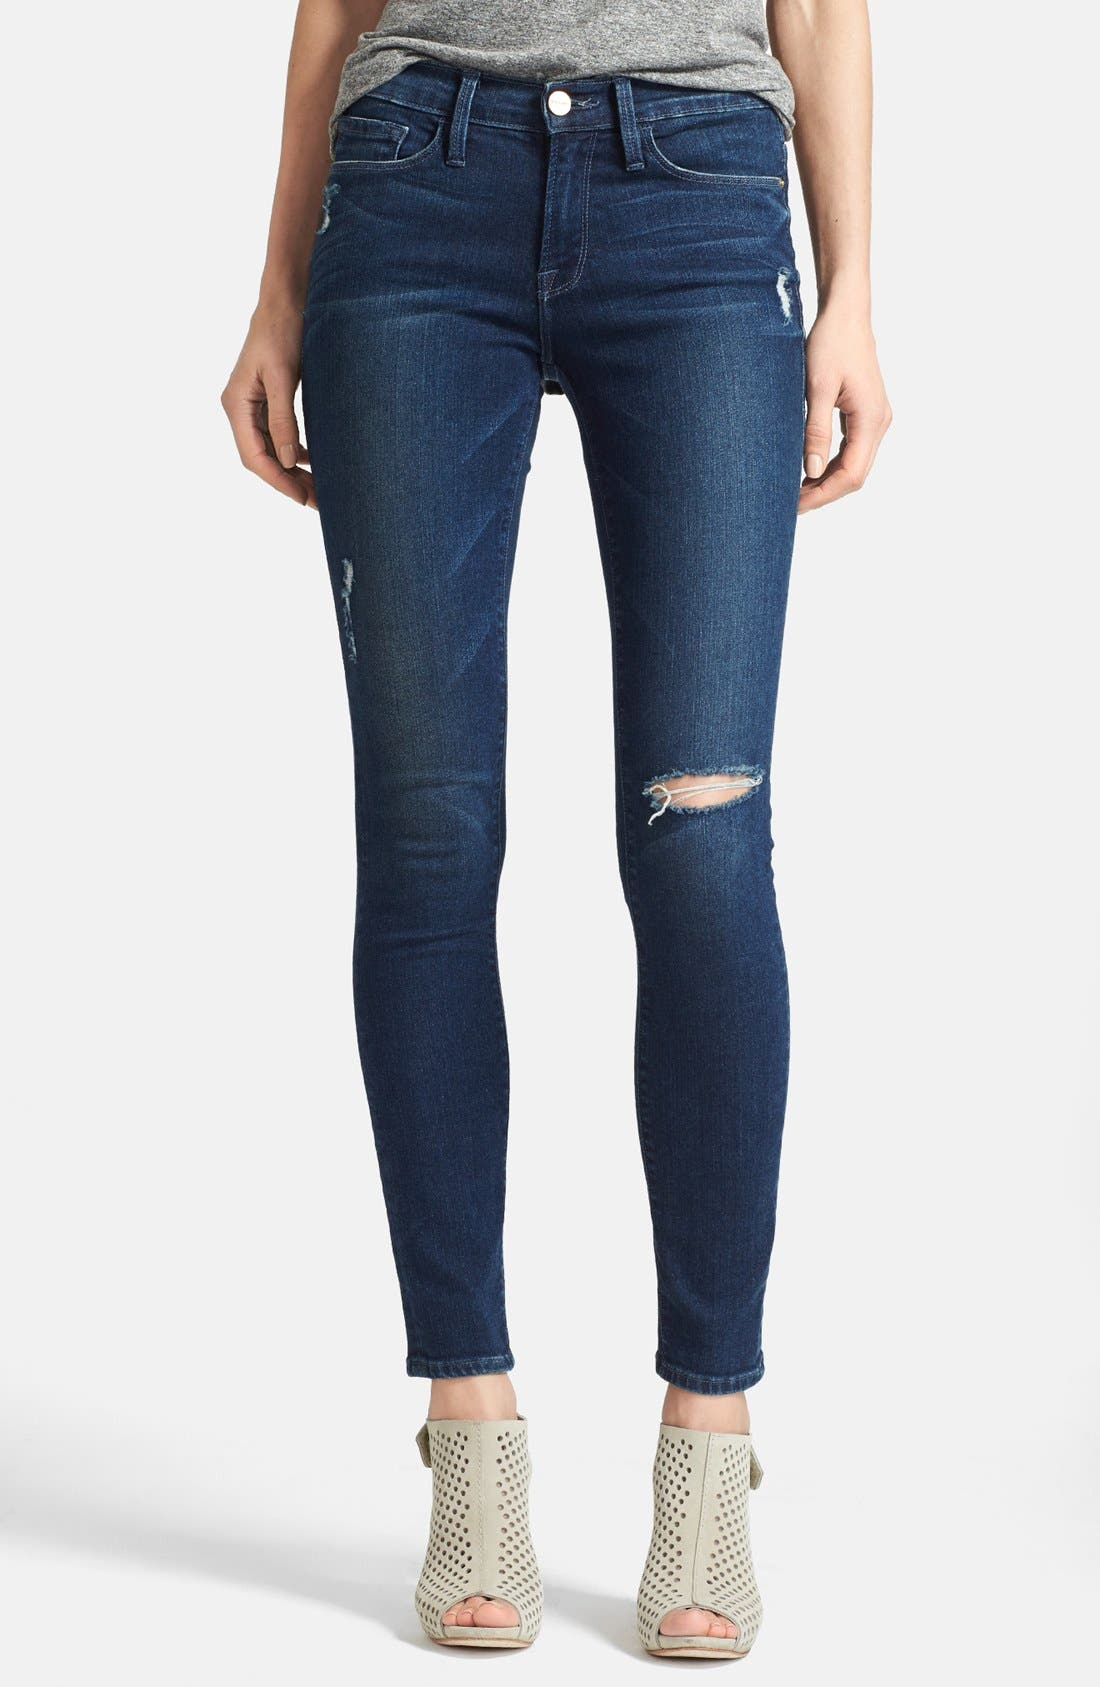 Main Image - Frame Denim 'Le Skinny de Jeanne' Jeans (Runyon Canyon)